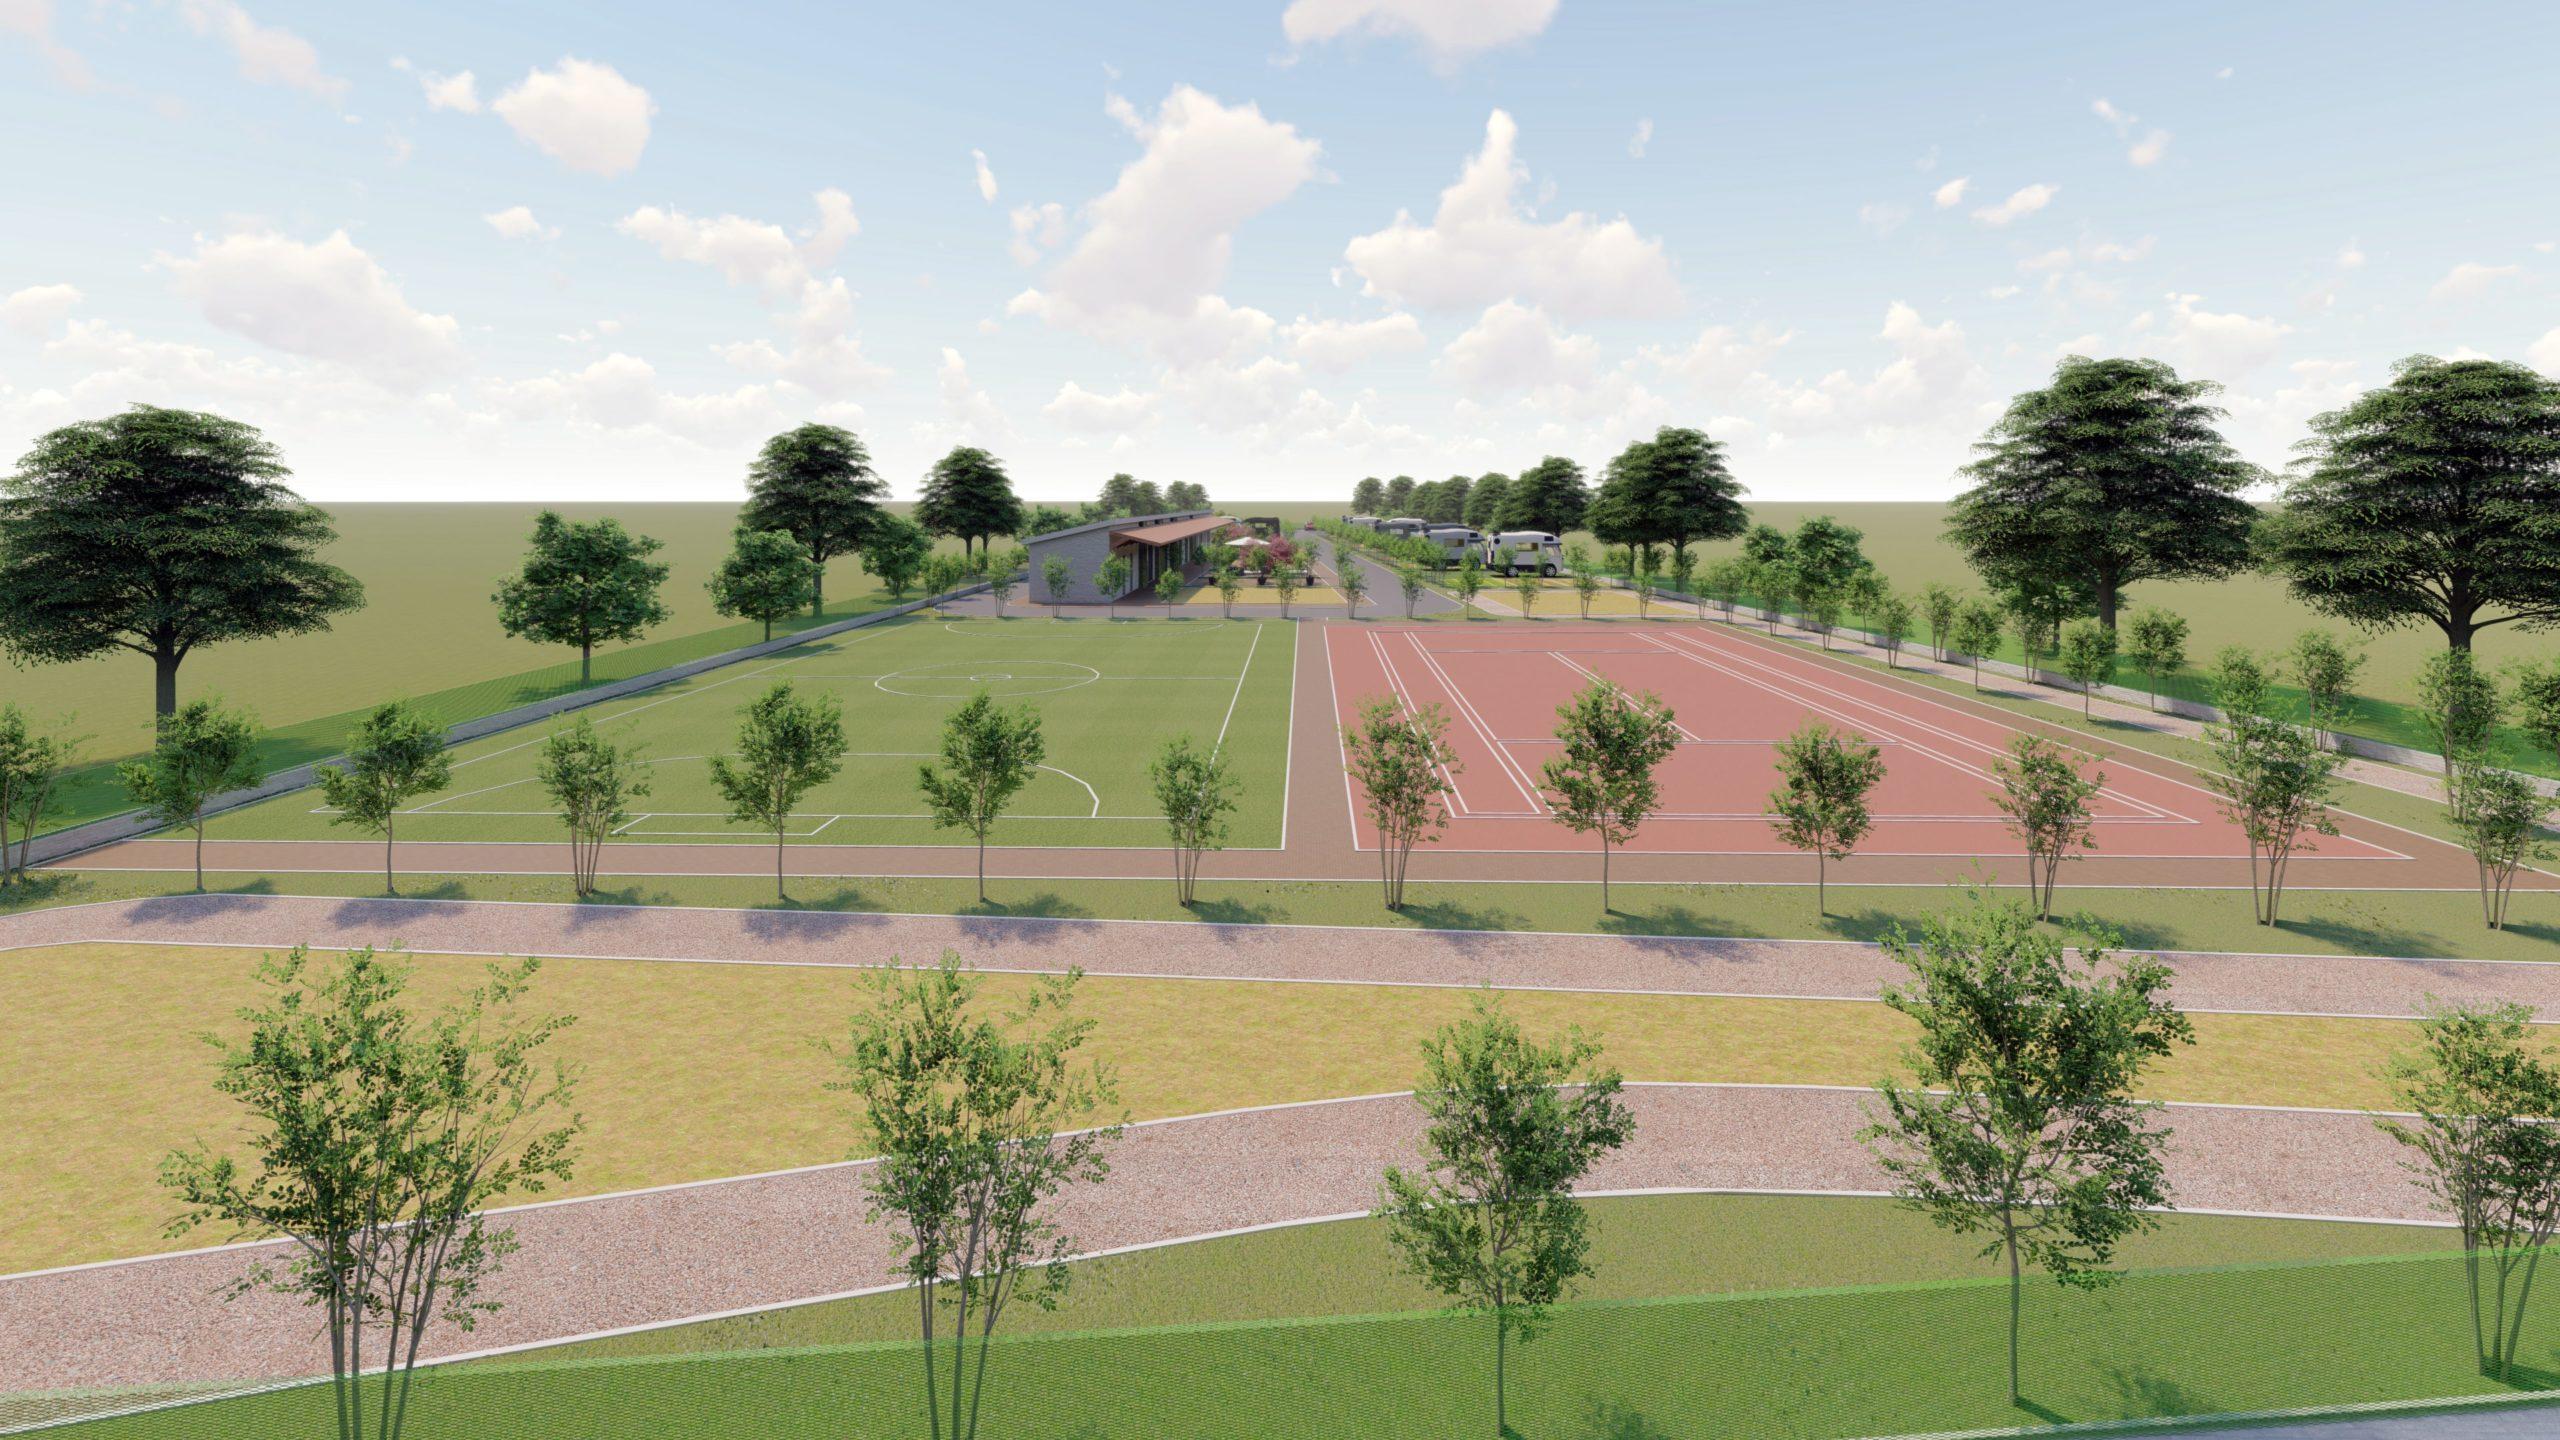 Agricampeggio Area sport 1